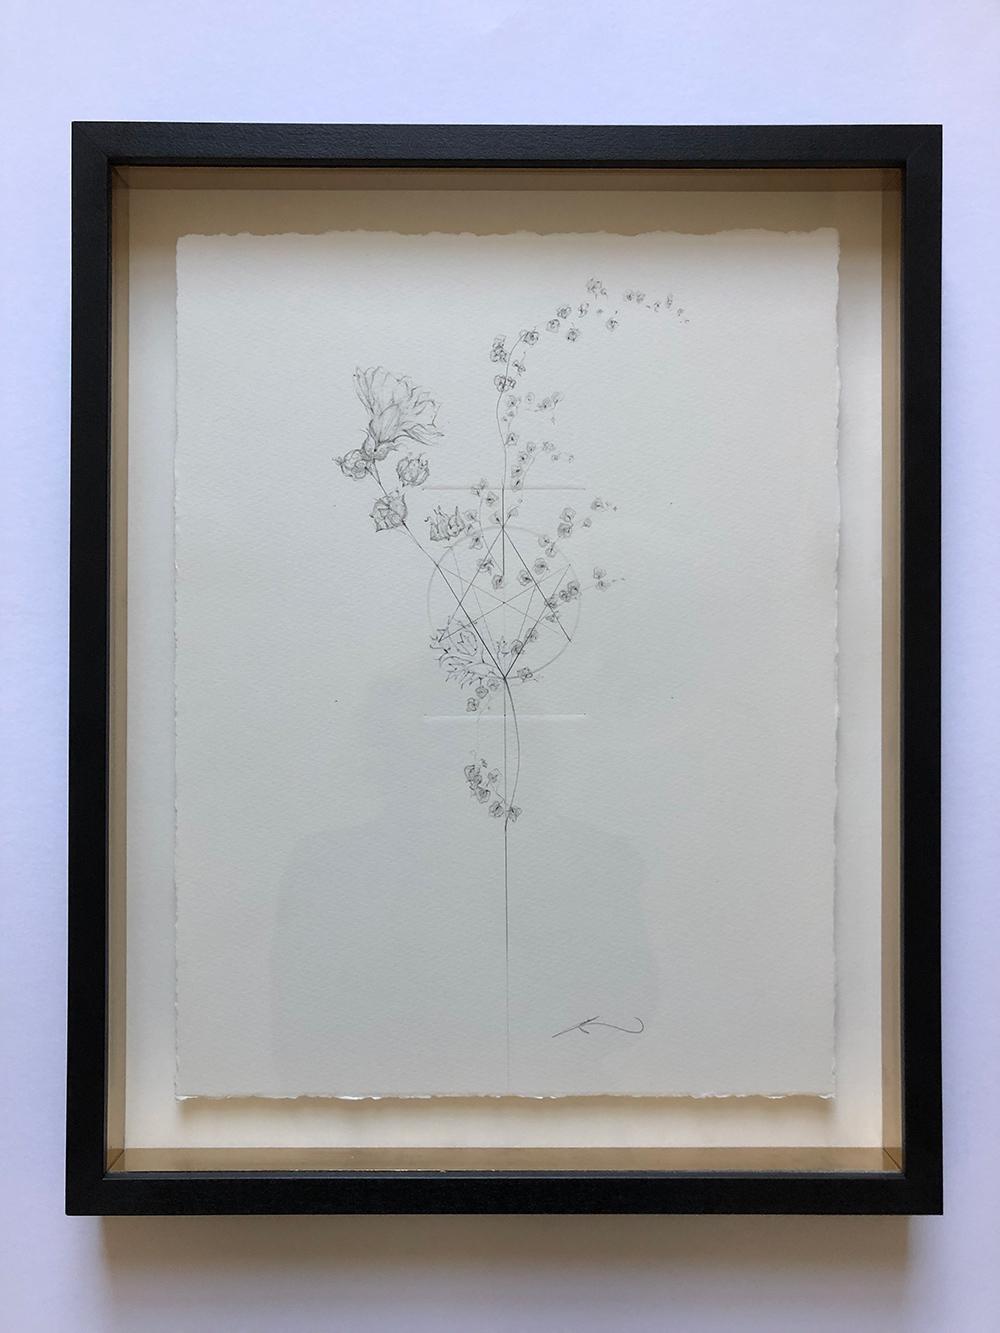 Jessica-albarn-2-meadow-flowers-1.jpg